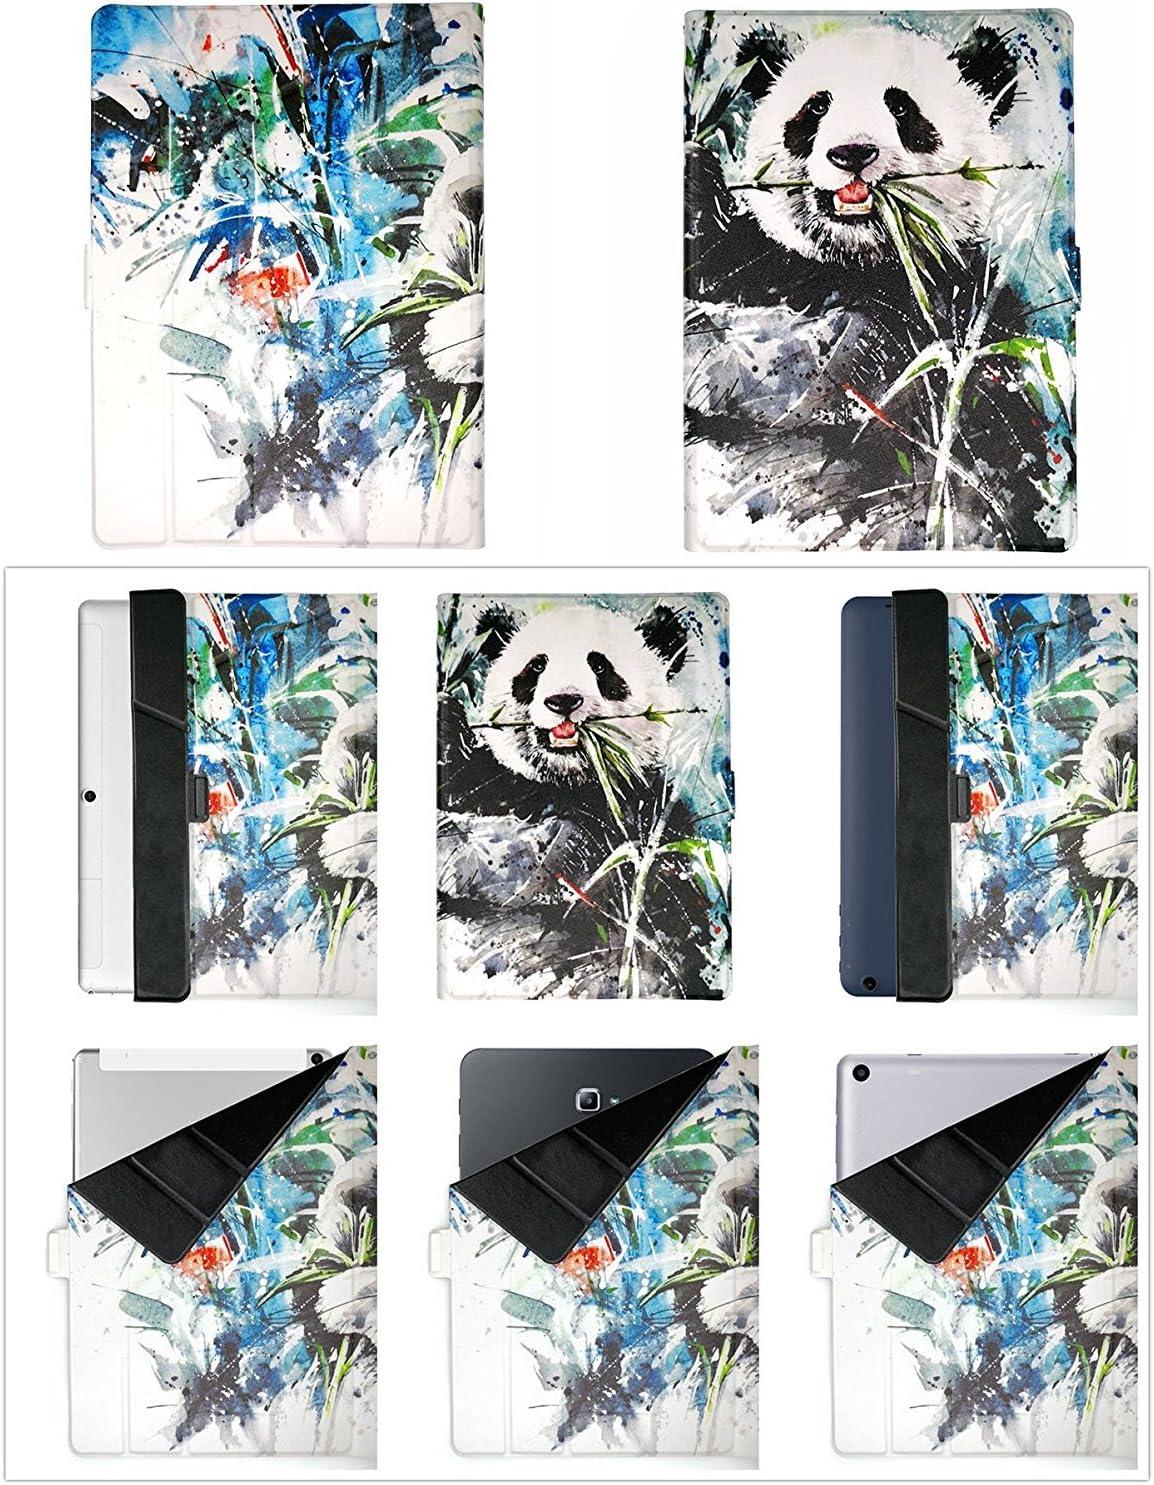 Lovewlb Tablet Custodia per Majestic Tab-711 4g Custodia Pelle Stand Case Cover HS